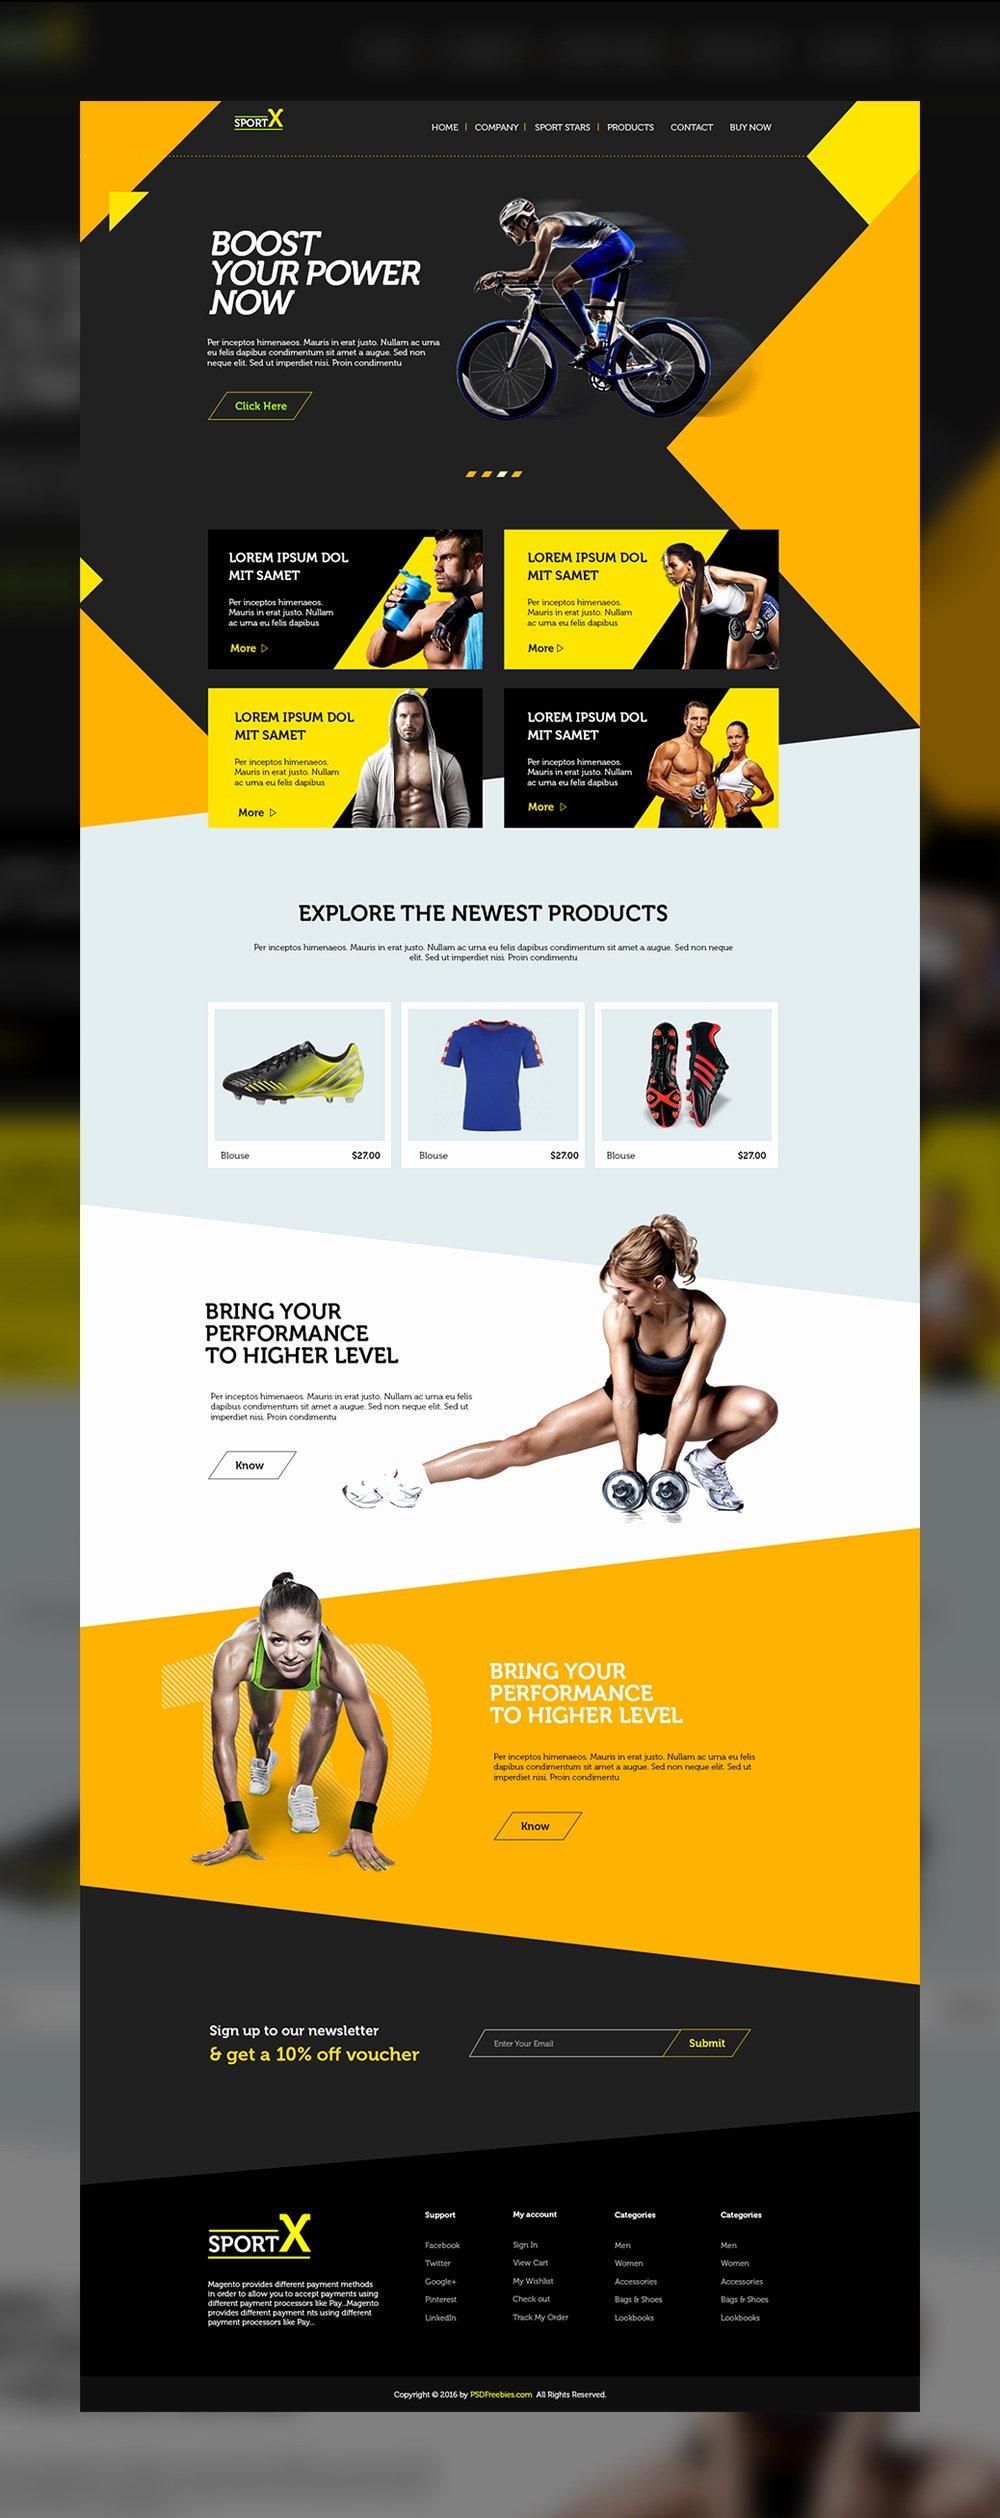 Sports Web Site Template Luxury Sports Shop Website Multipurpose Free Psd Template